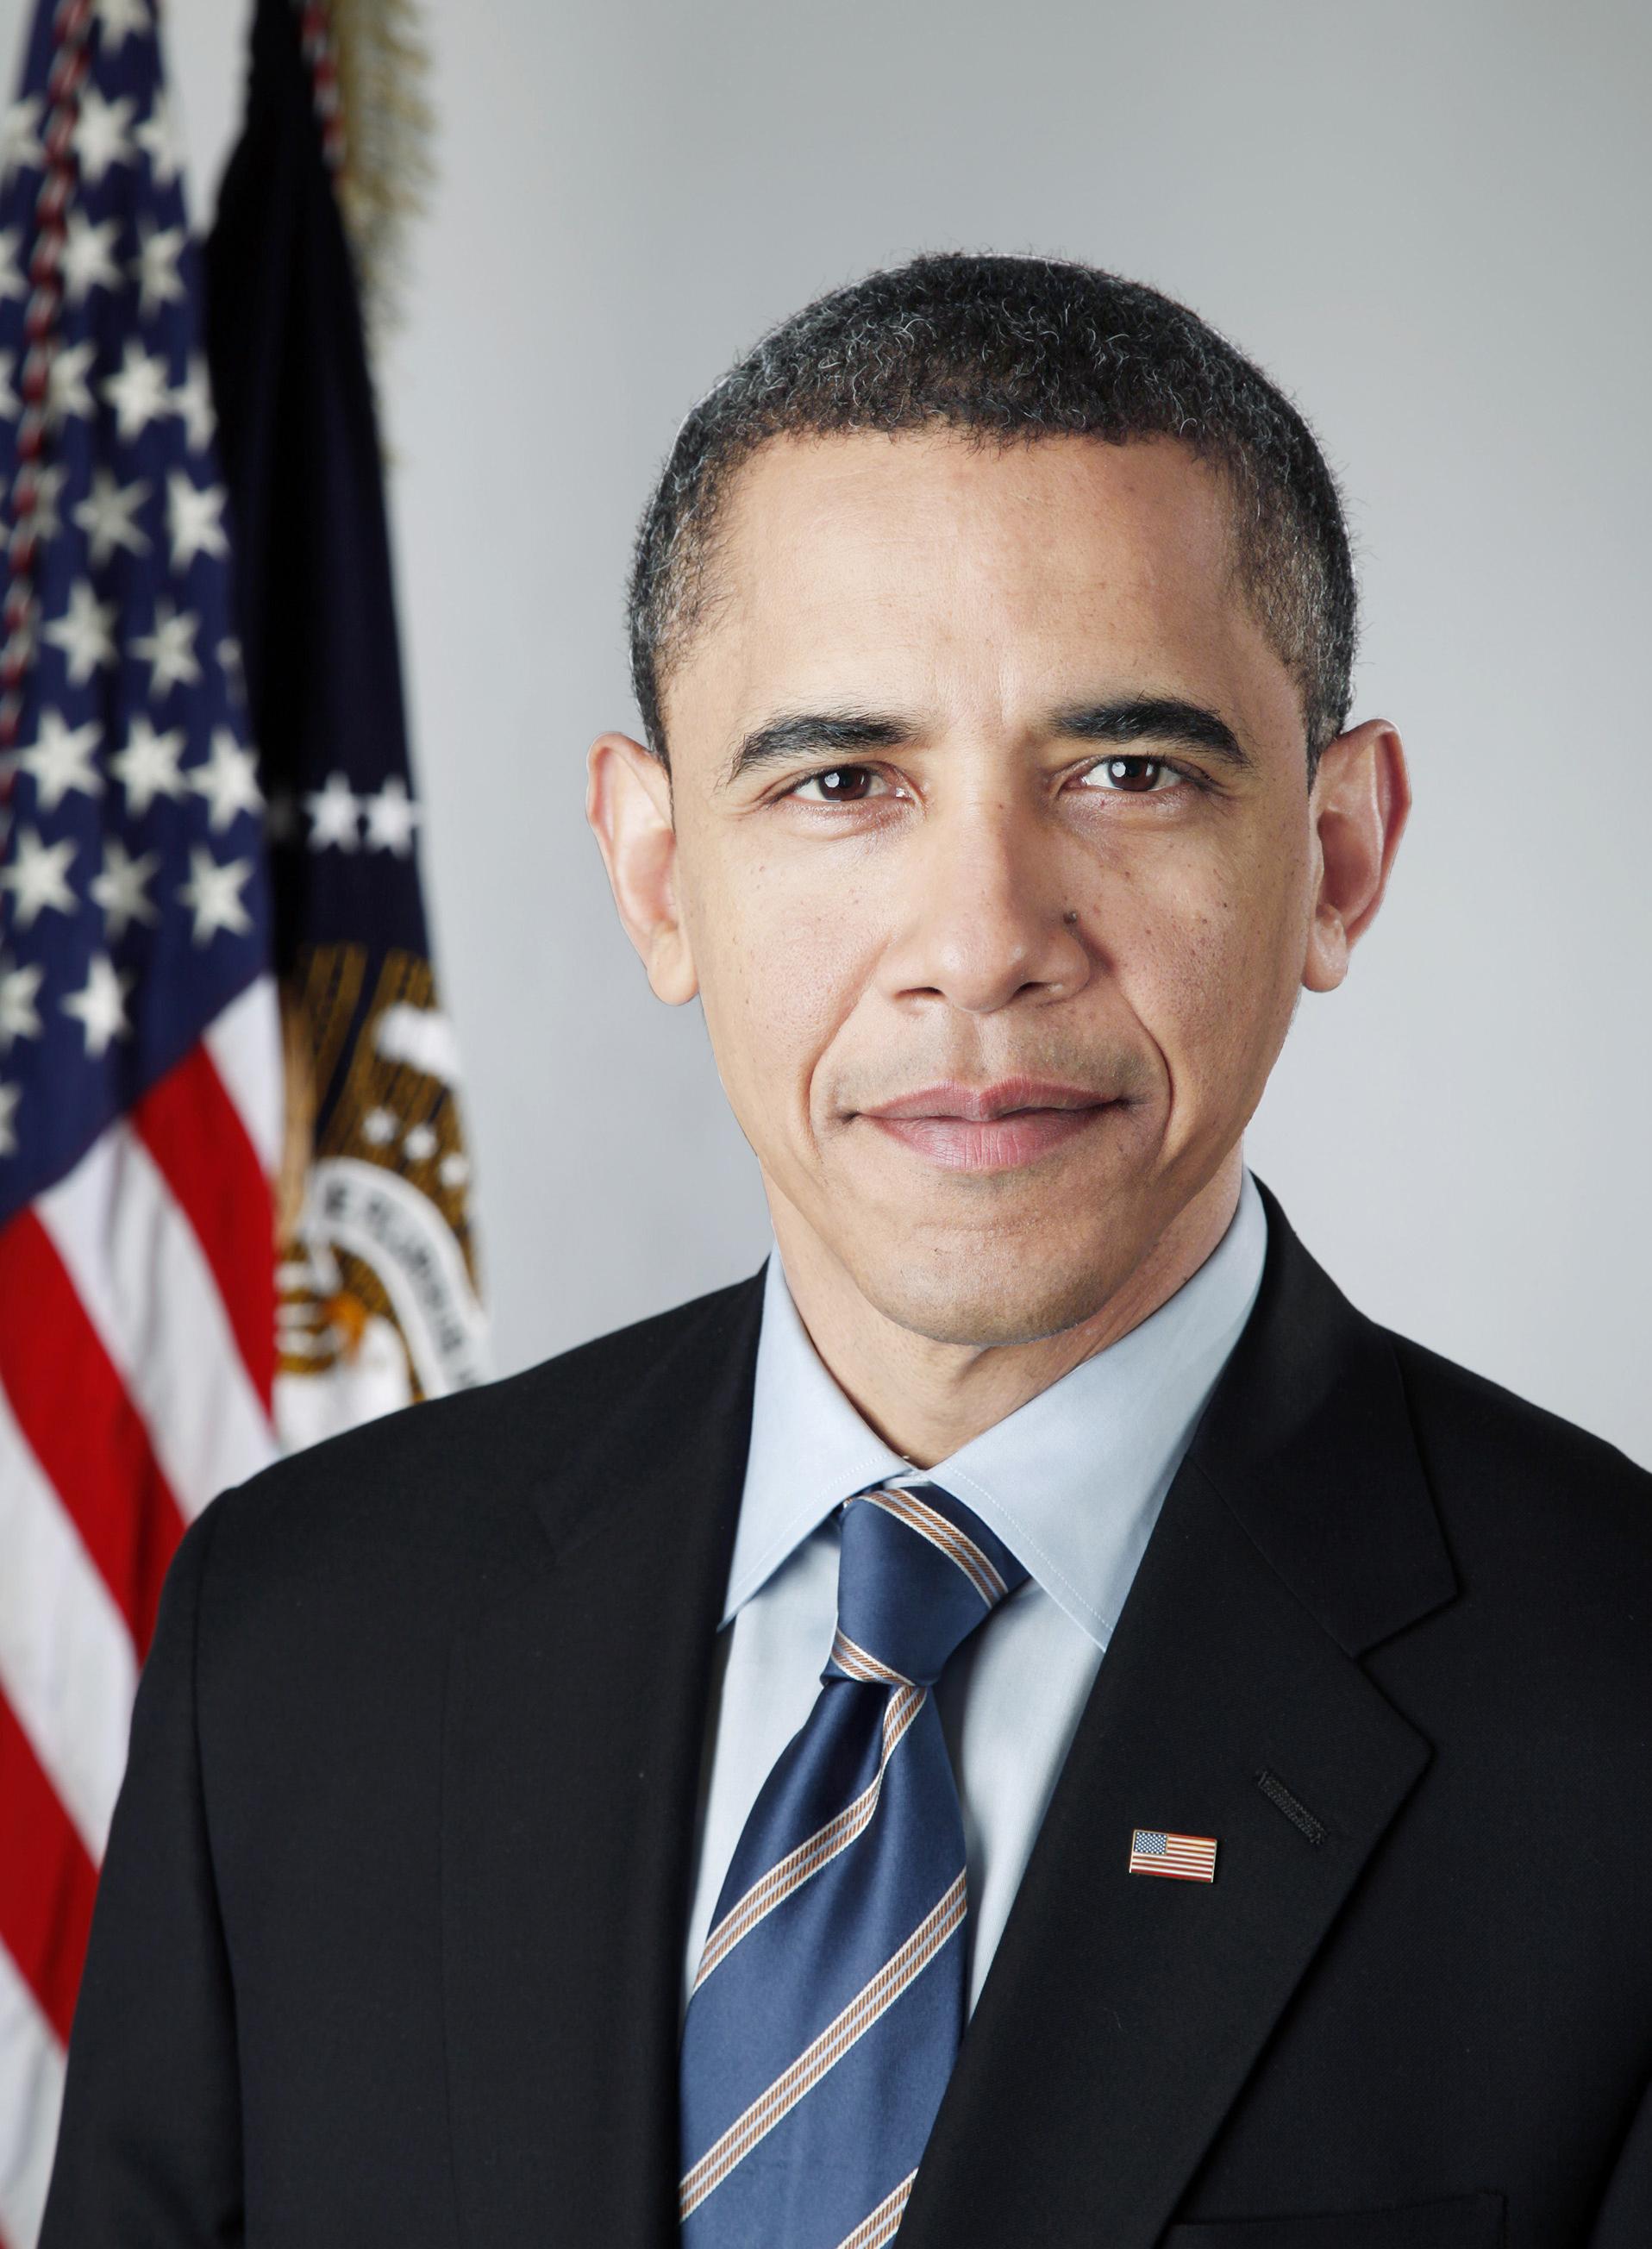 Obama 100 - Copy (2) - Copy.jpg